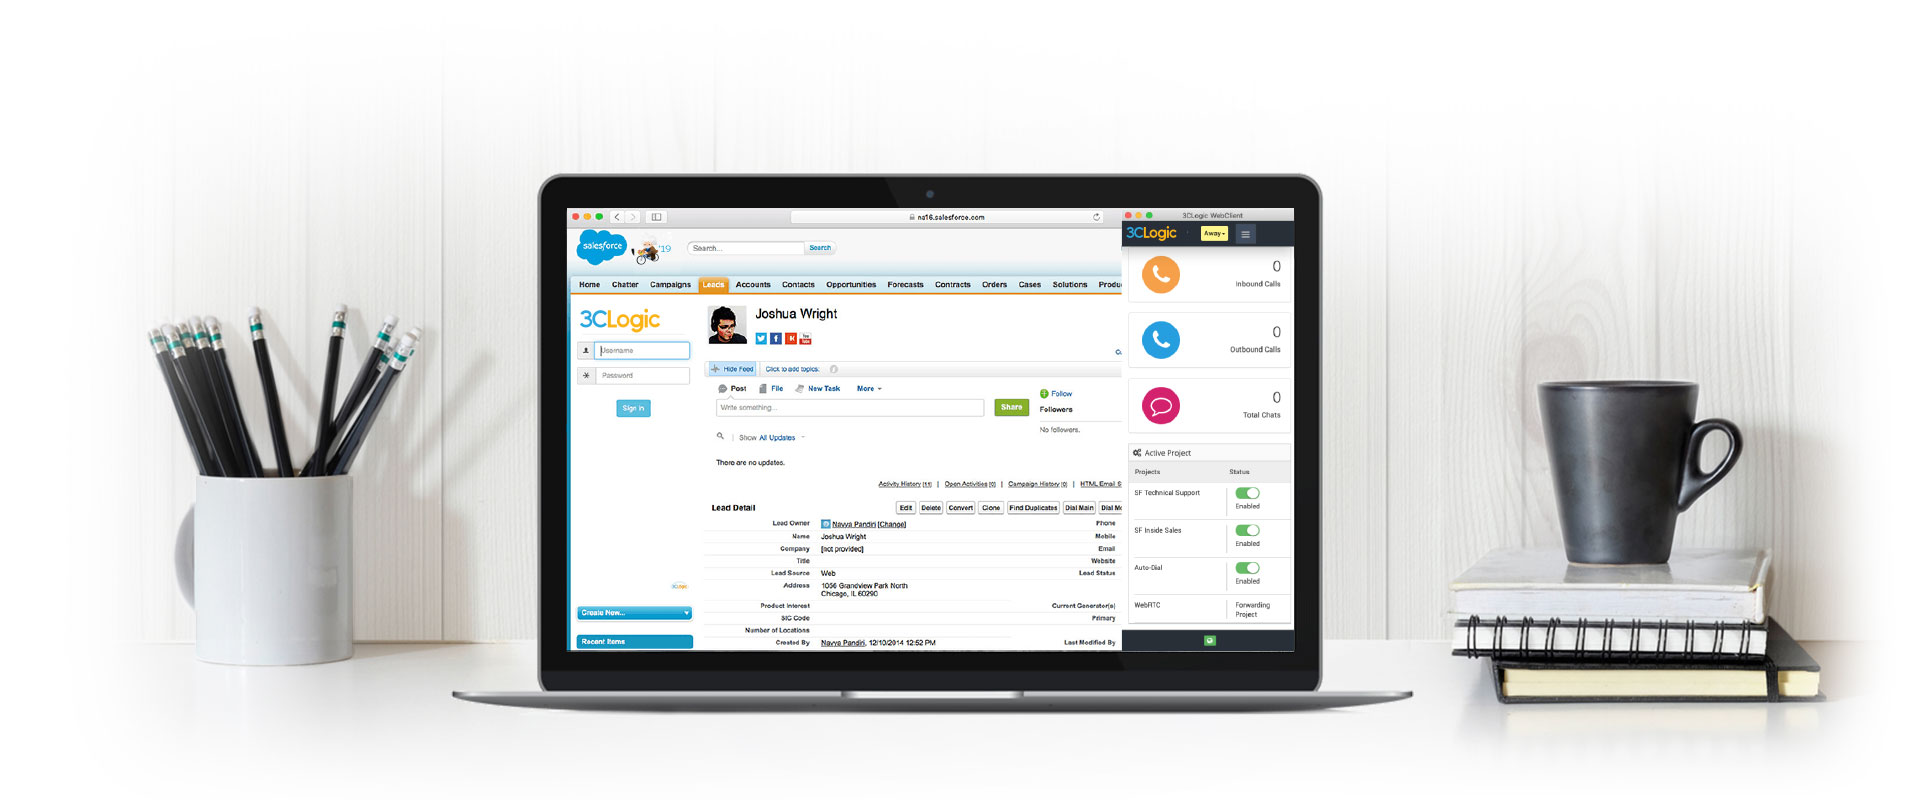 Laptop with screenshot of 3CLogic's Salesforce integration